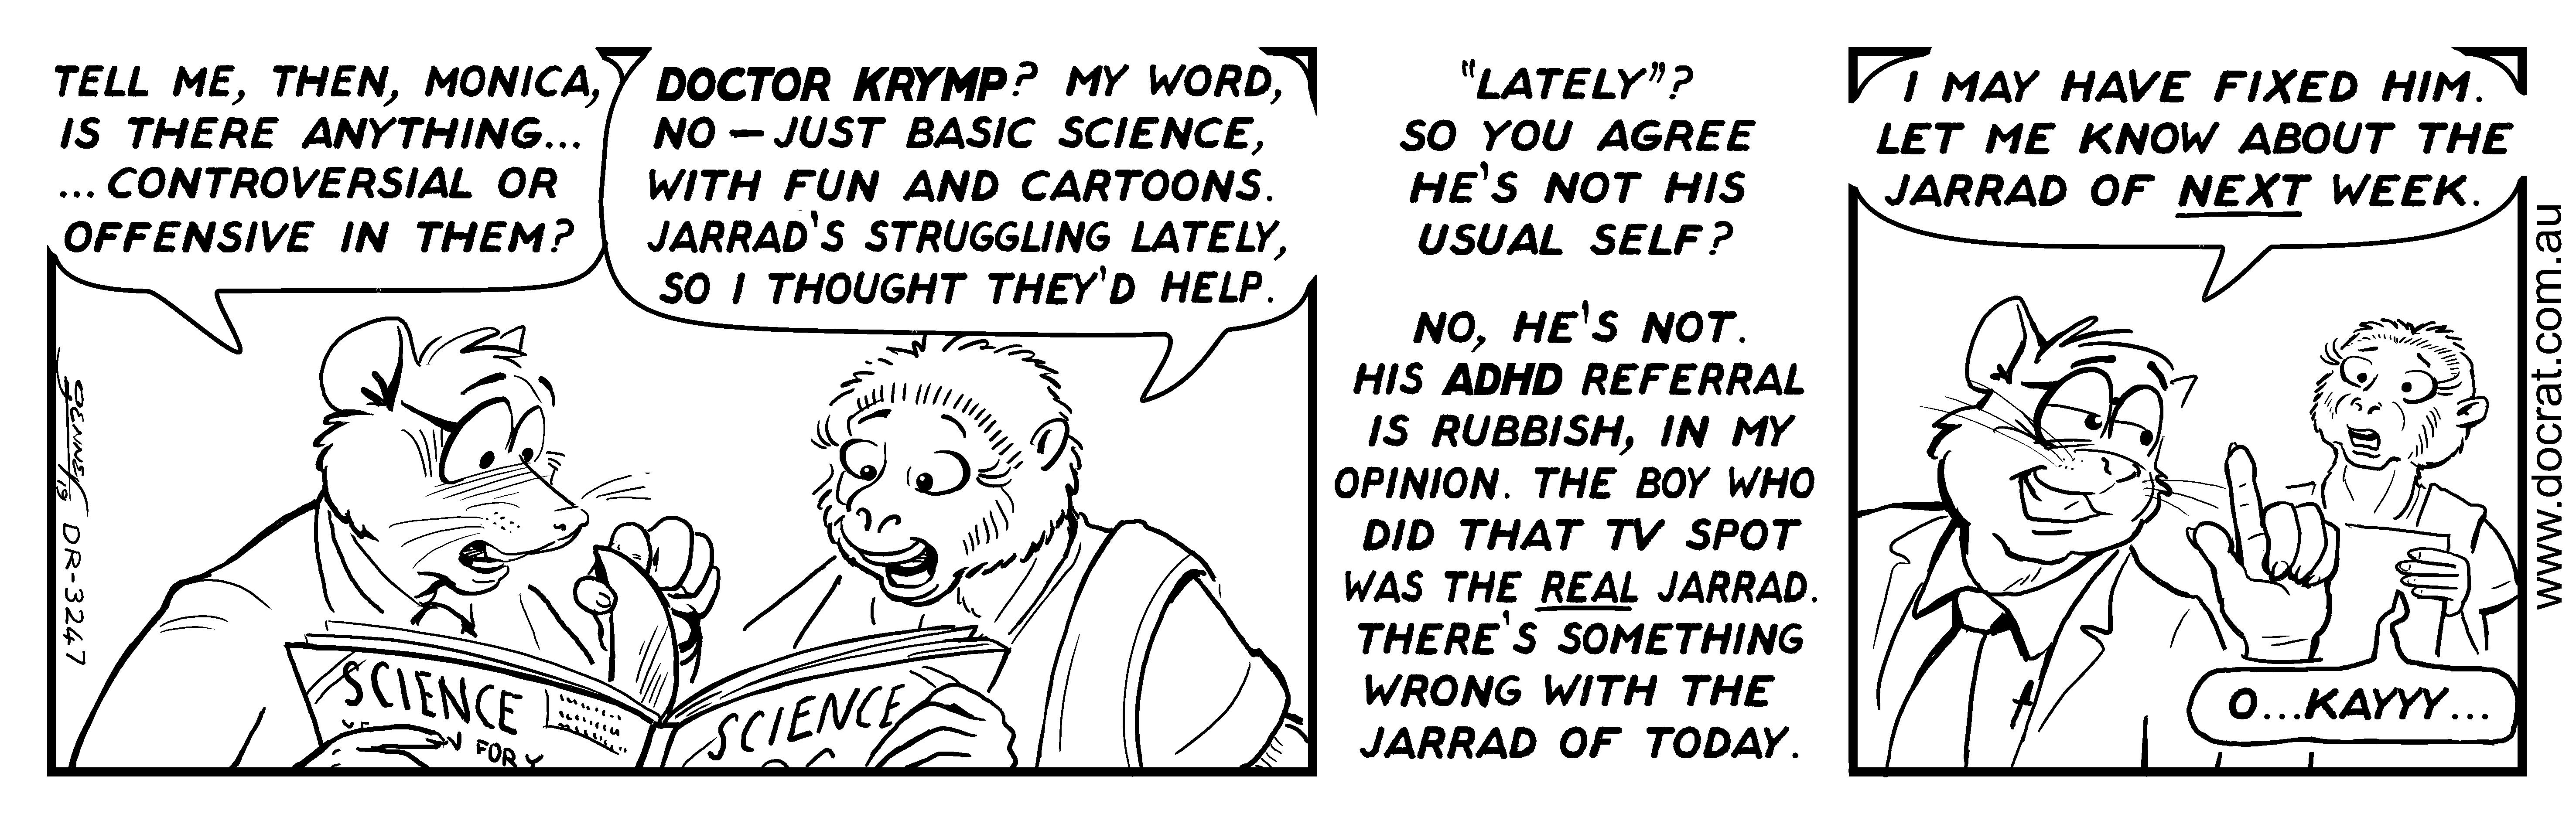 20190521